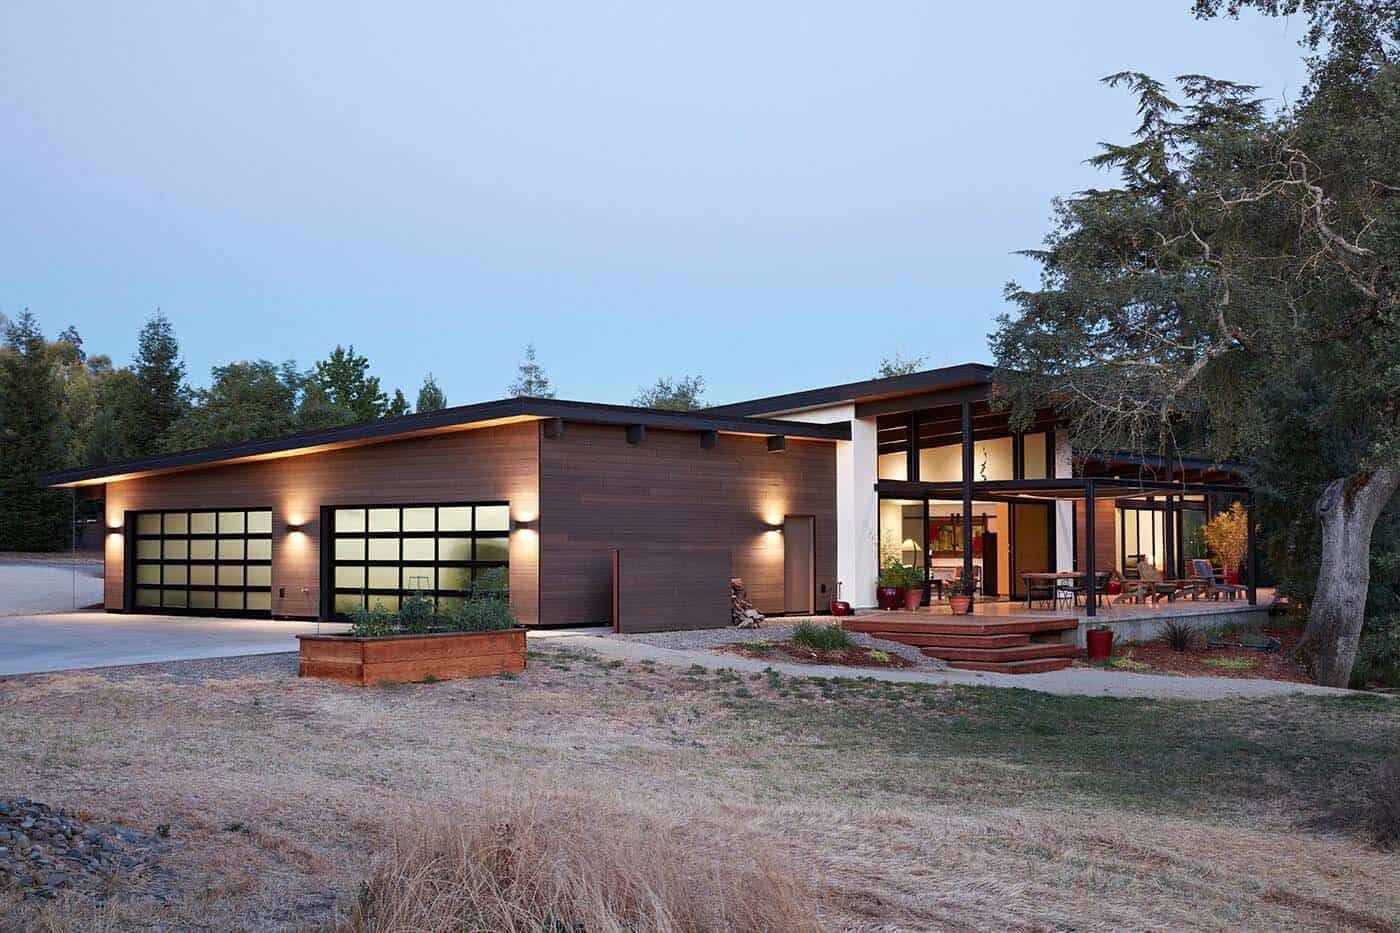 Sacramento Modern Residence-Klopf Architecture-18-1 Kindesign